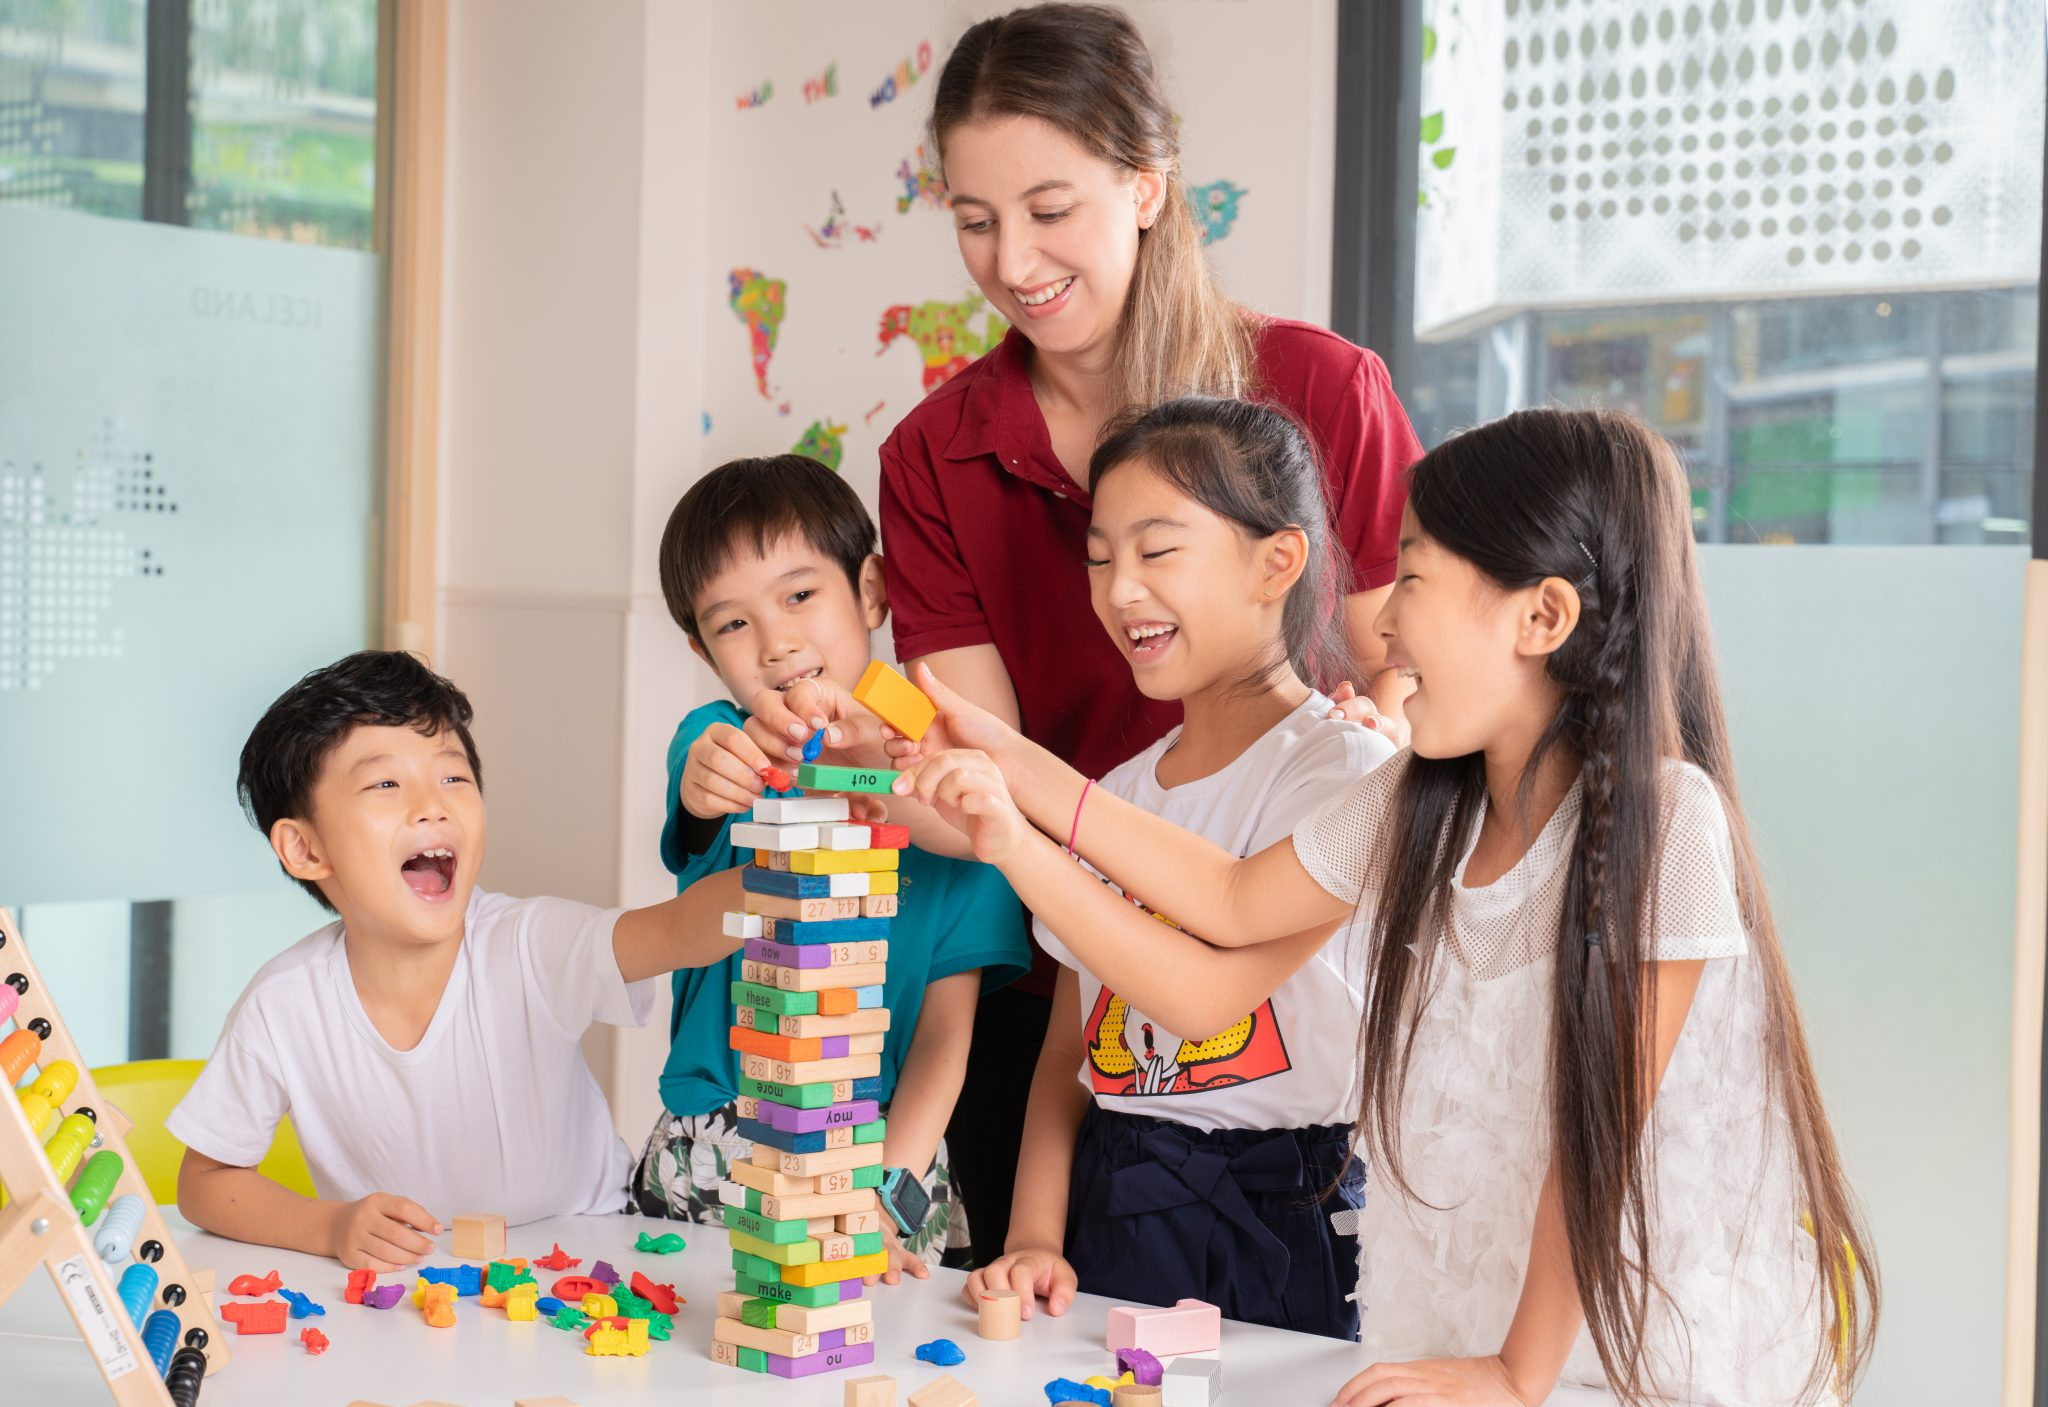 Top 5 ESL Games, Top 5 ESL Games – Teach in China, SDE Seadragon Education